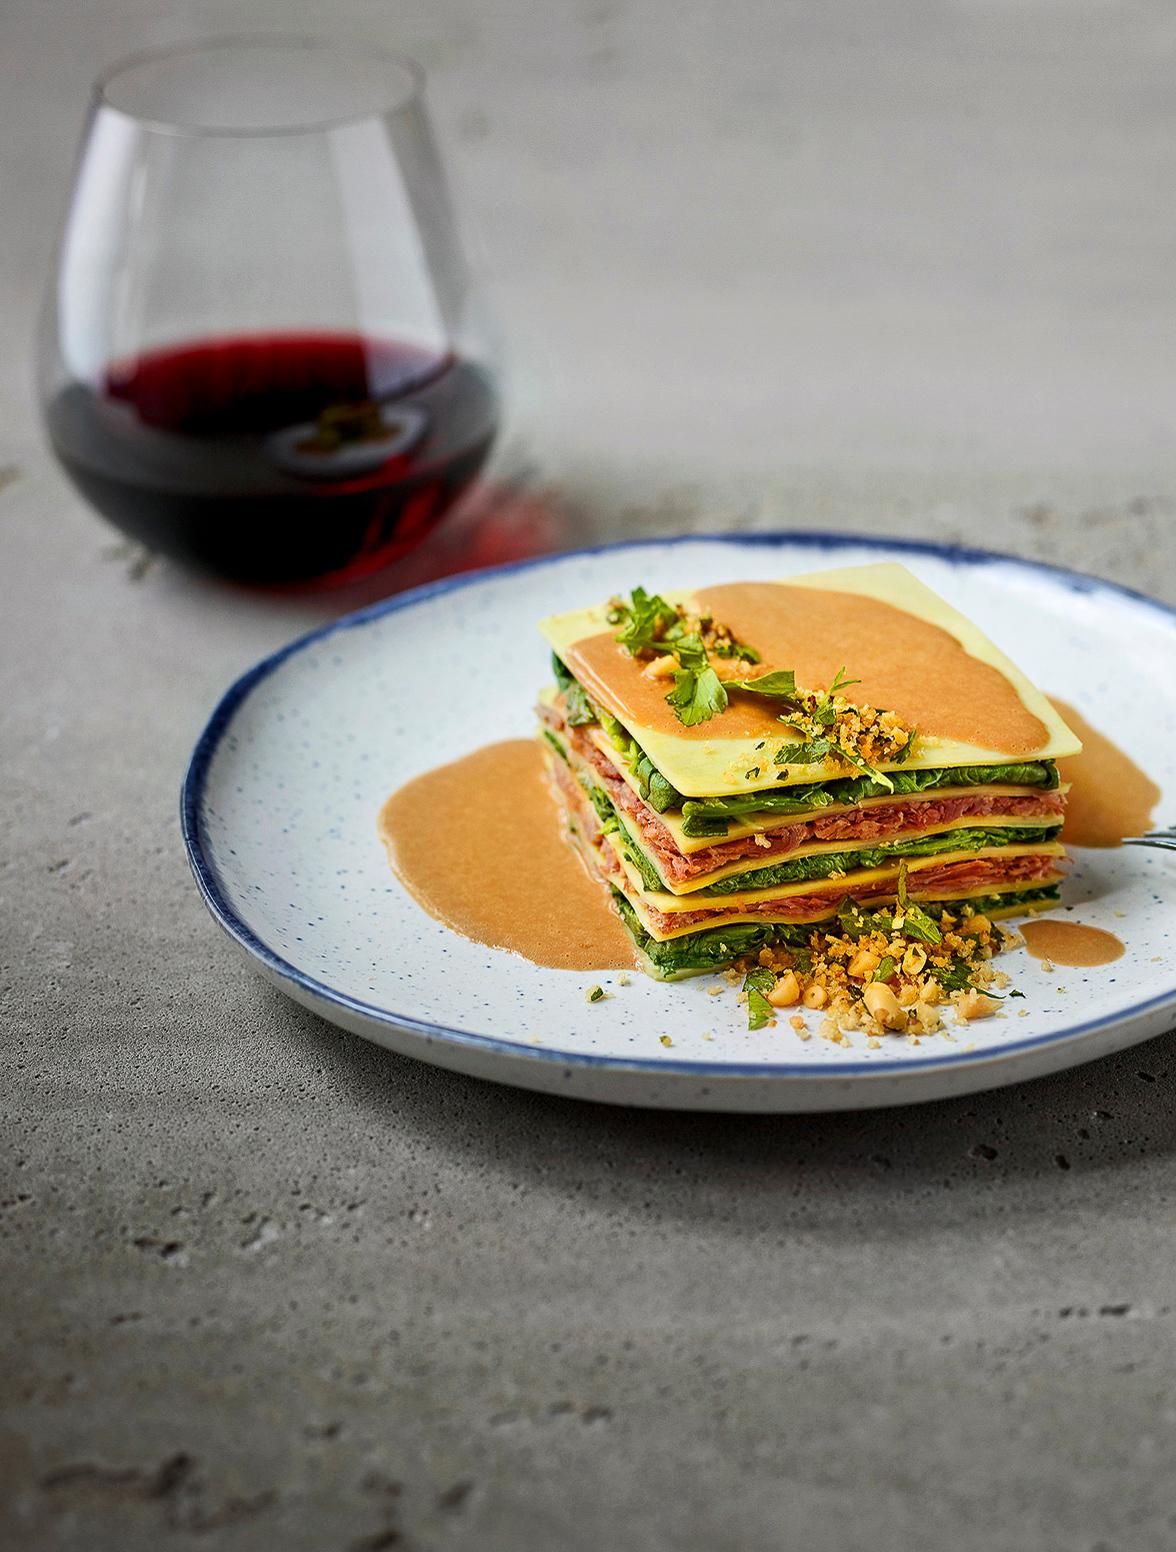 Chef Daniel Vezina's menu for new Air Transat food service program